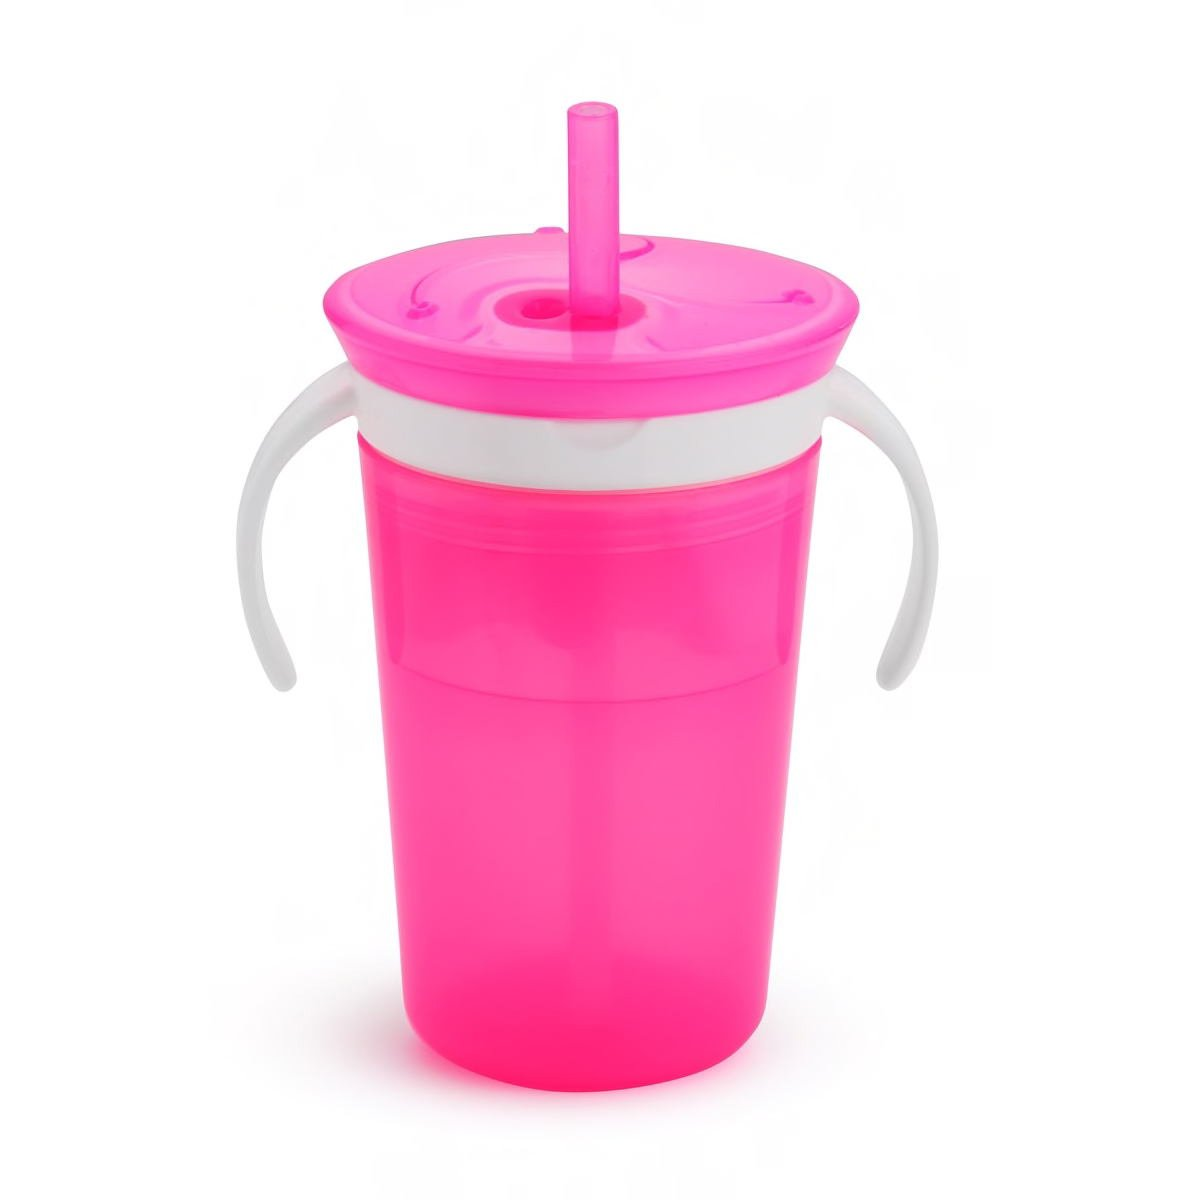 Munchkin Sippy Snack Cup Pink Ποτήρι 225ml & Πιατάκι 110ml – ροζ